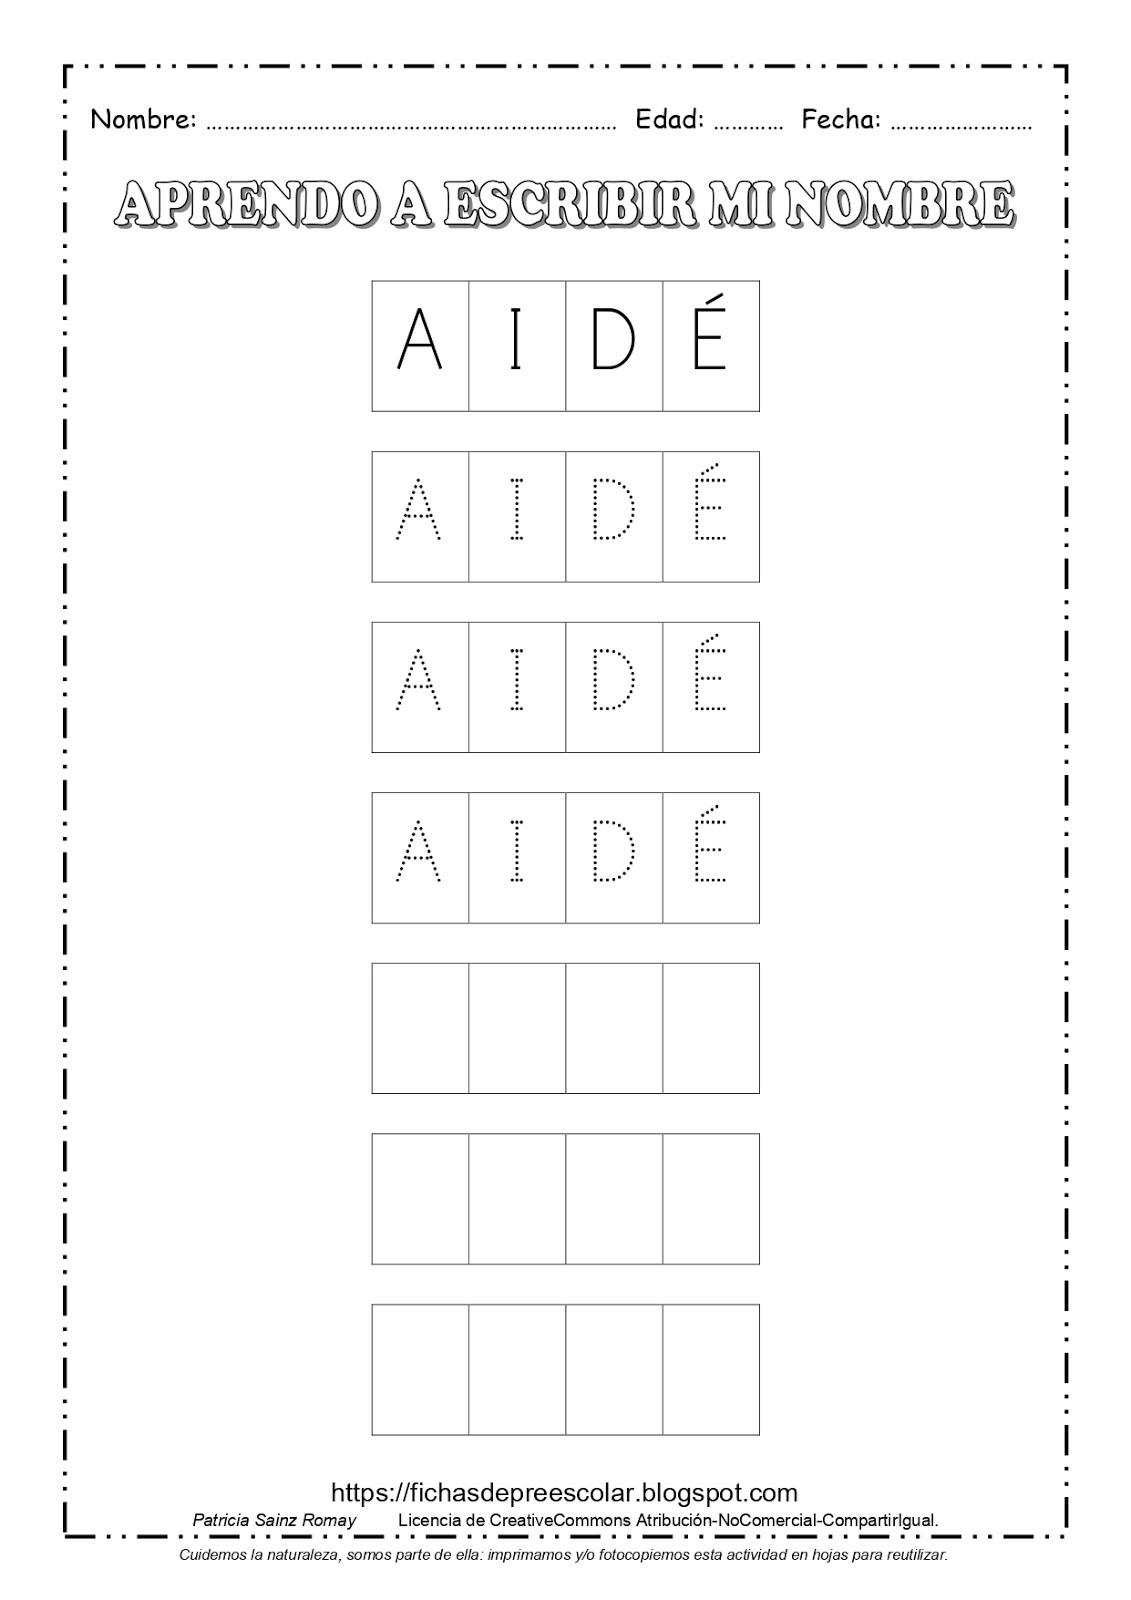 Fichas De Educación Preescolar Aprendo A Escribir Mi Nombre 4 Letras